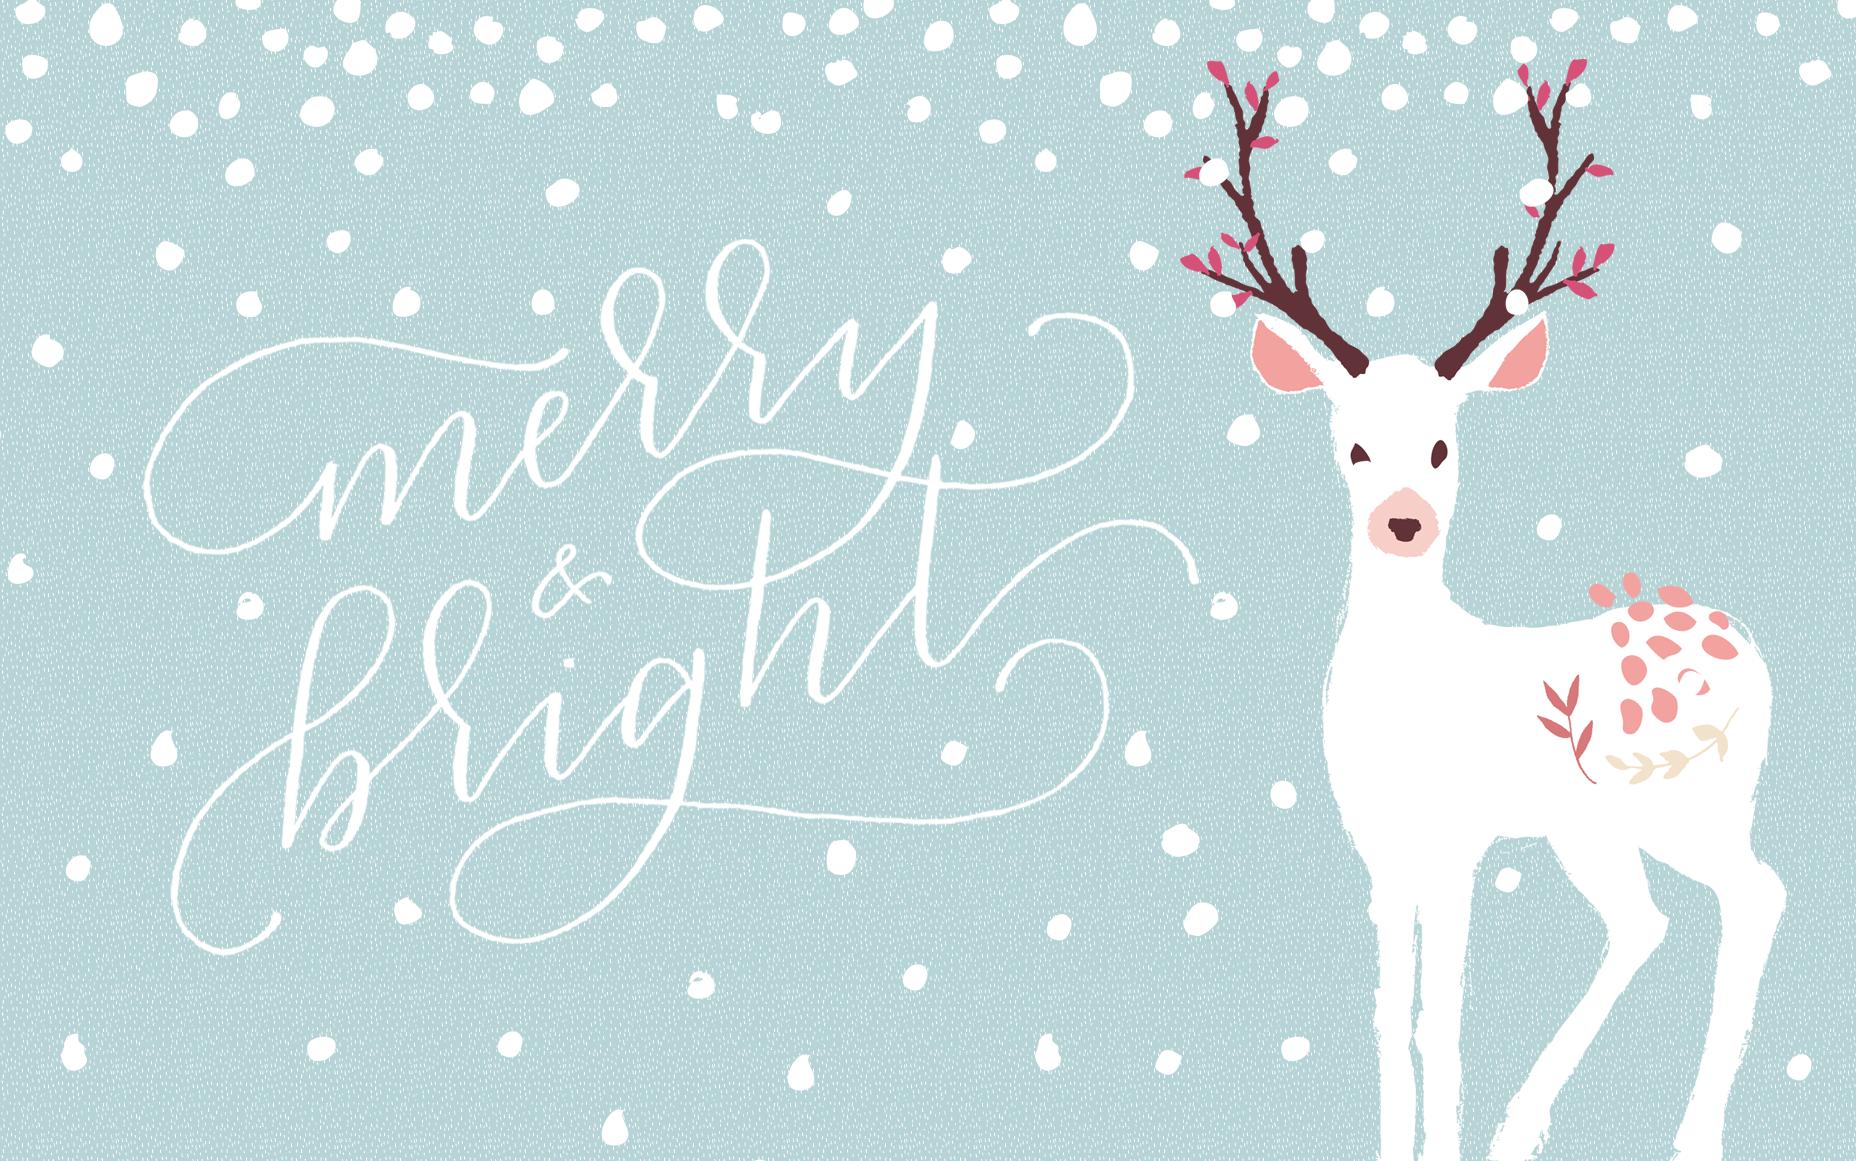 December Wallpaper Christmas desktop wallpaper, December